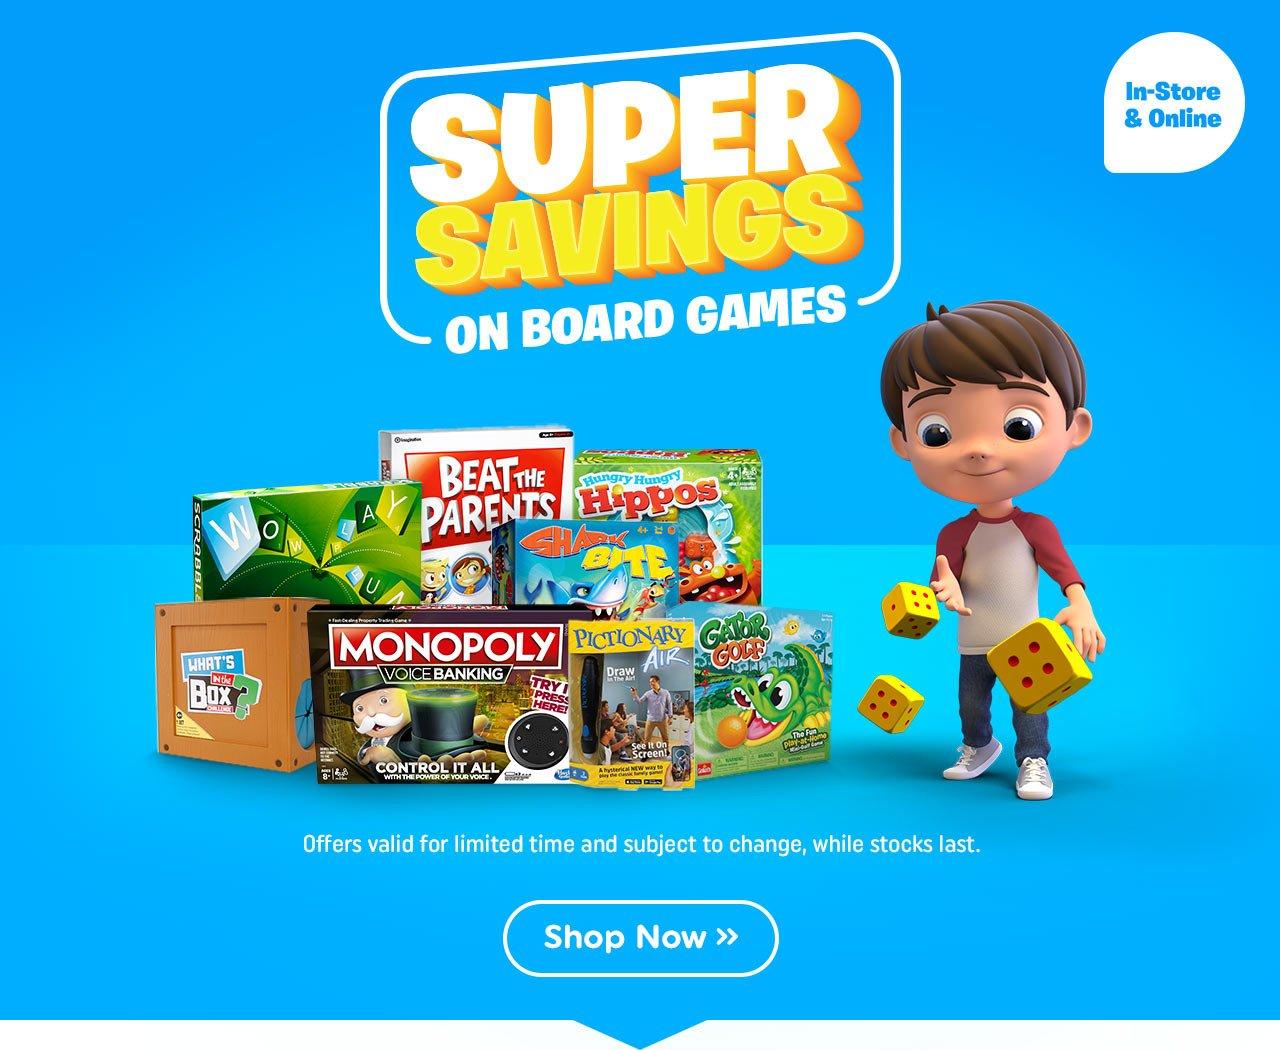 Super Savings on Board Games